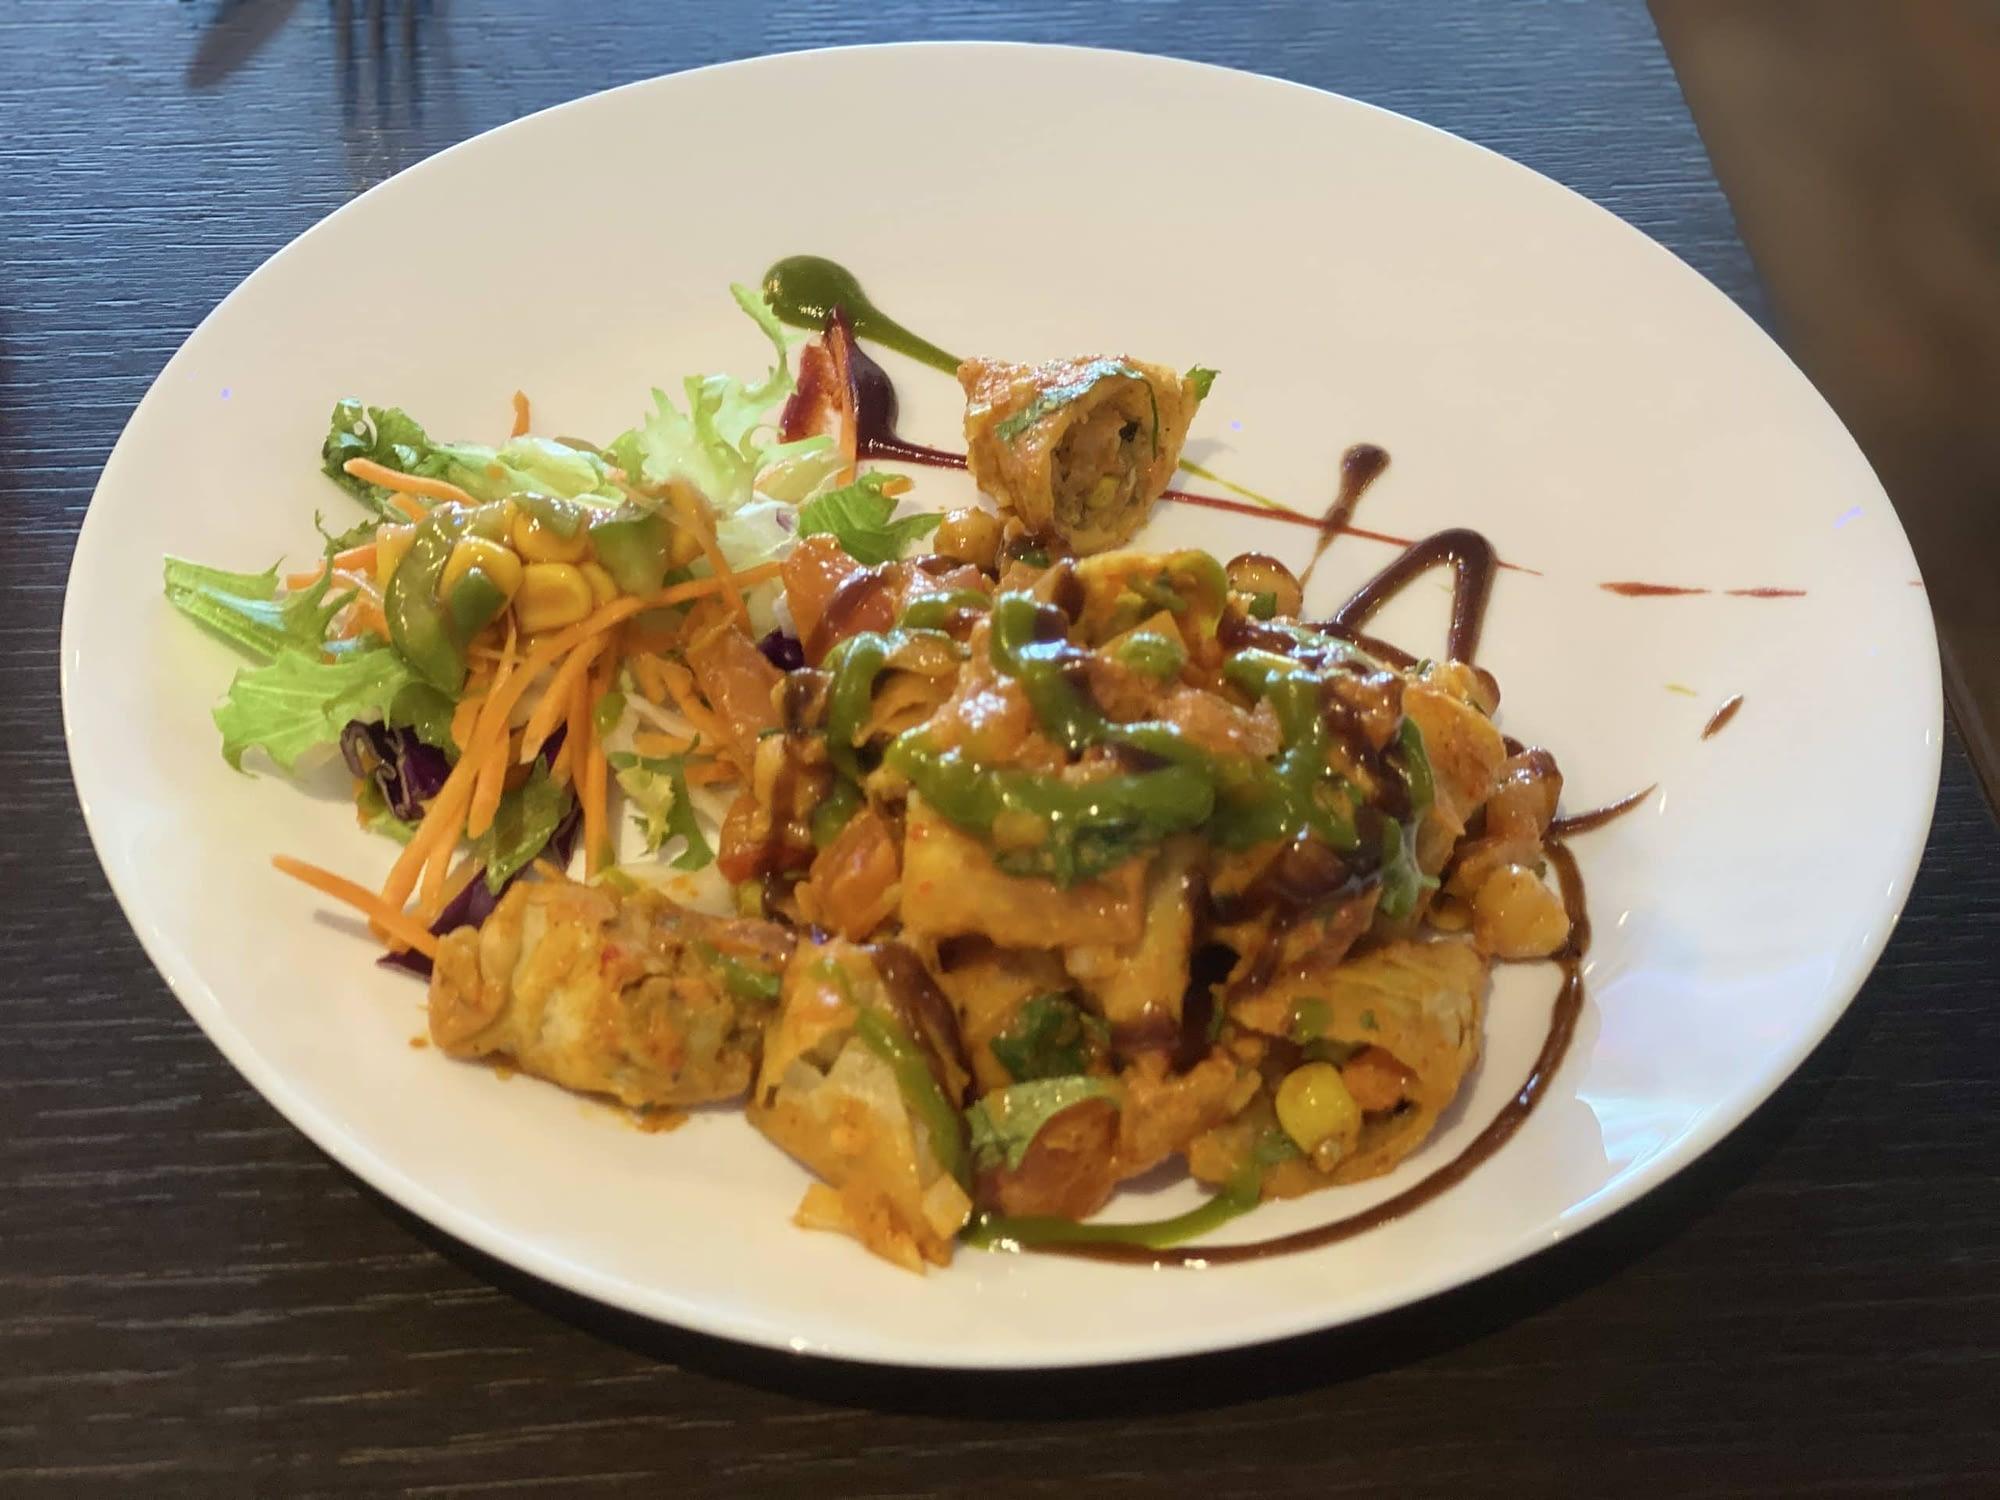 Rama Spice - Samosa Chaat